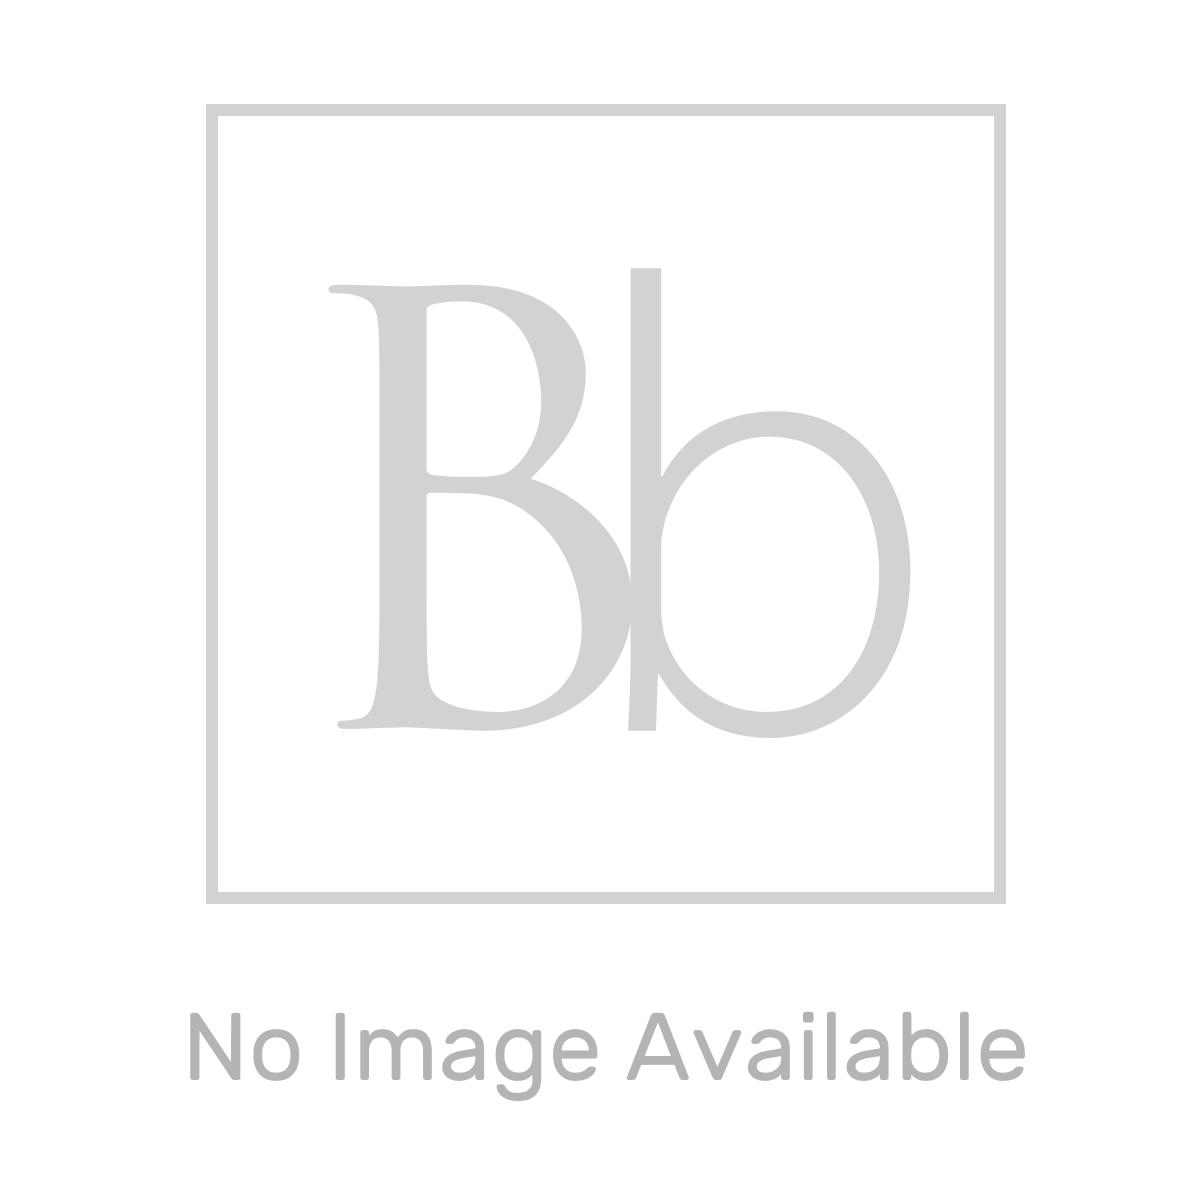 Salamander RP120SU 3.6 Bar Single Universal Whole House Shower Pump Right Side